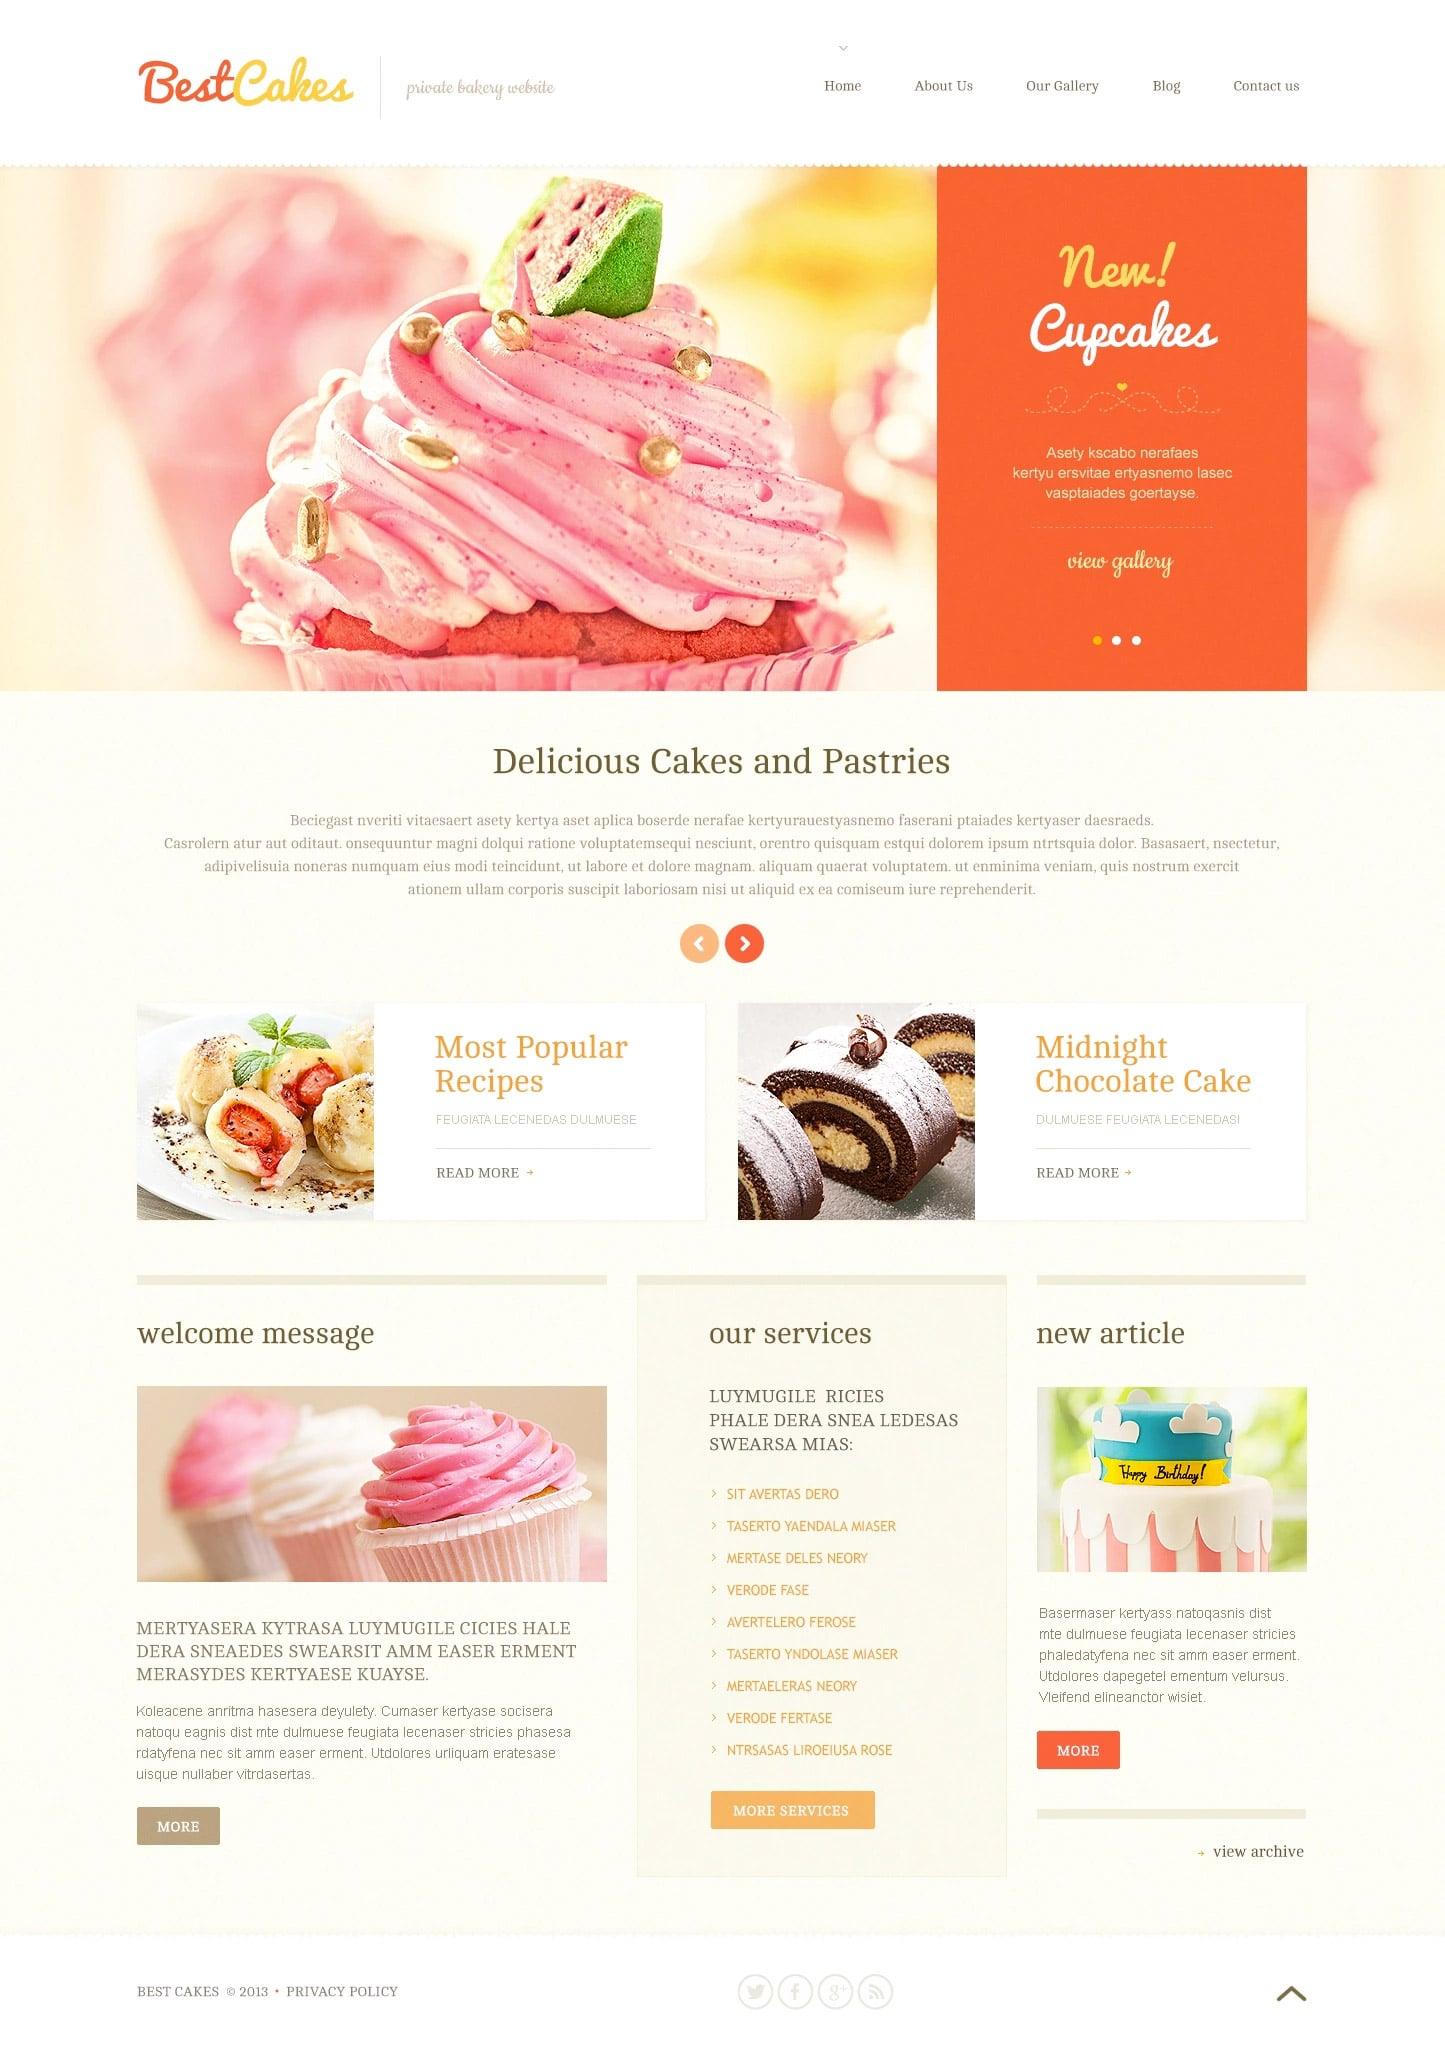 WordPress Food Blog Themes - 10 Premium WP Templates - Untitled 6